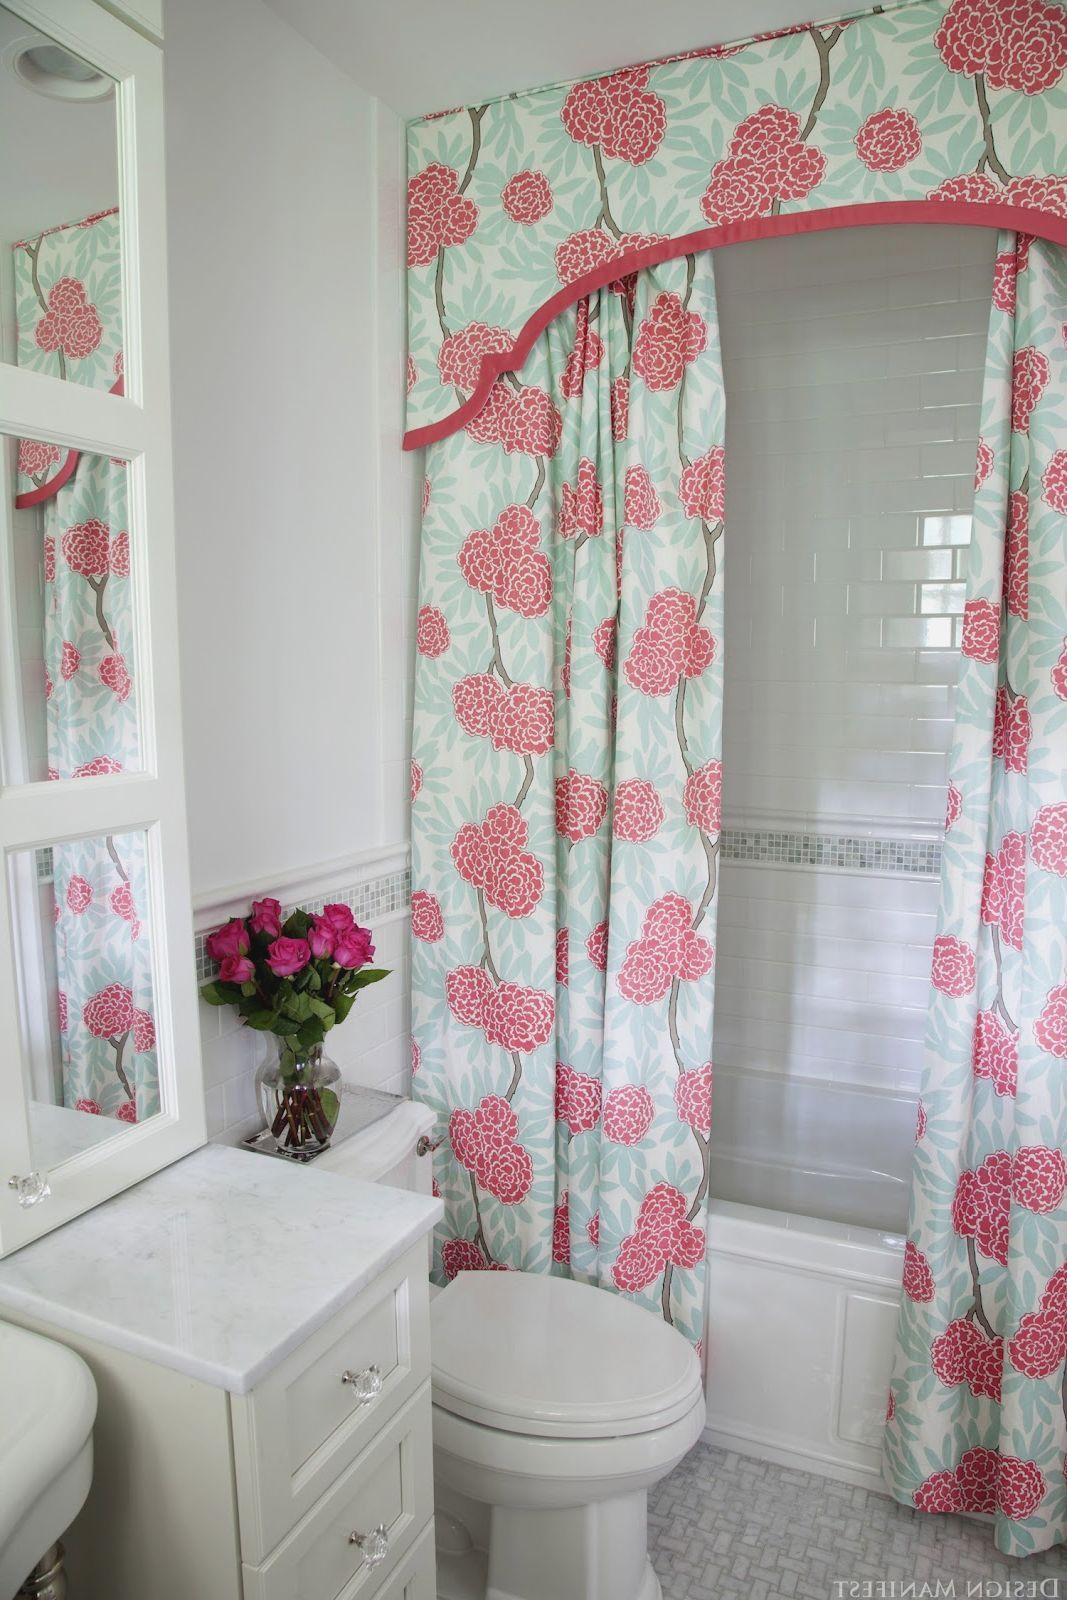 Pink Tile Bathroom Decorating Ideas Modern Home Design Pink Bathroom Tiles Girly Bathroom Hanging Curtains